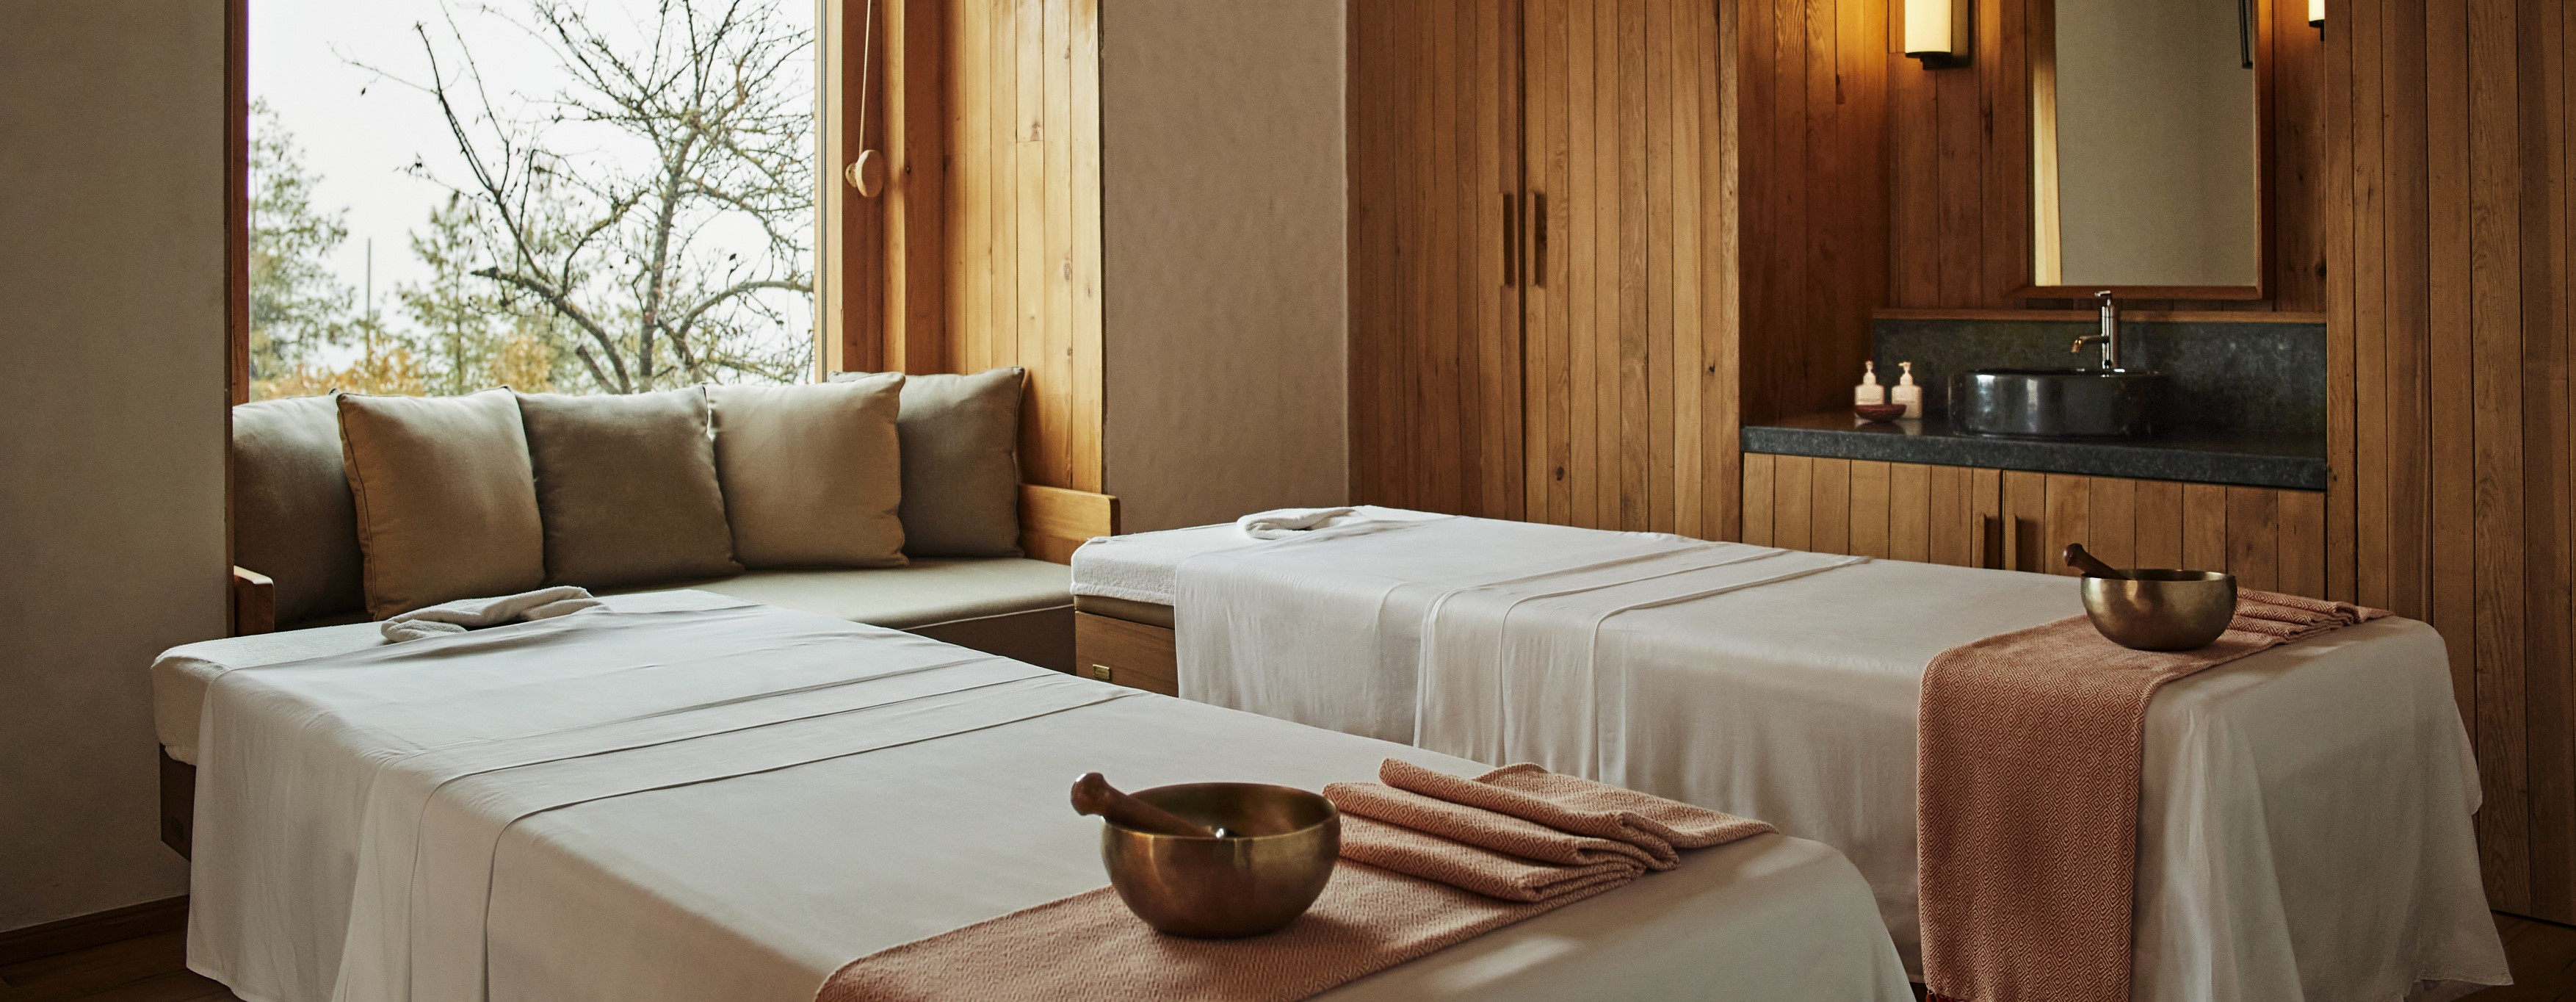 Six-Senses-Thimphu-Bhutan-Spa